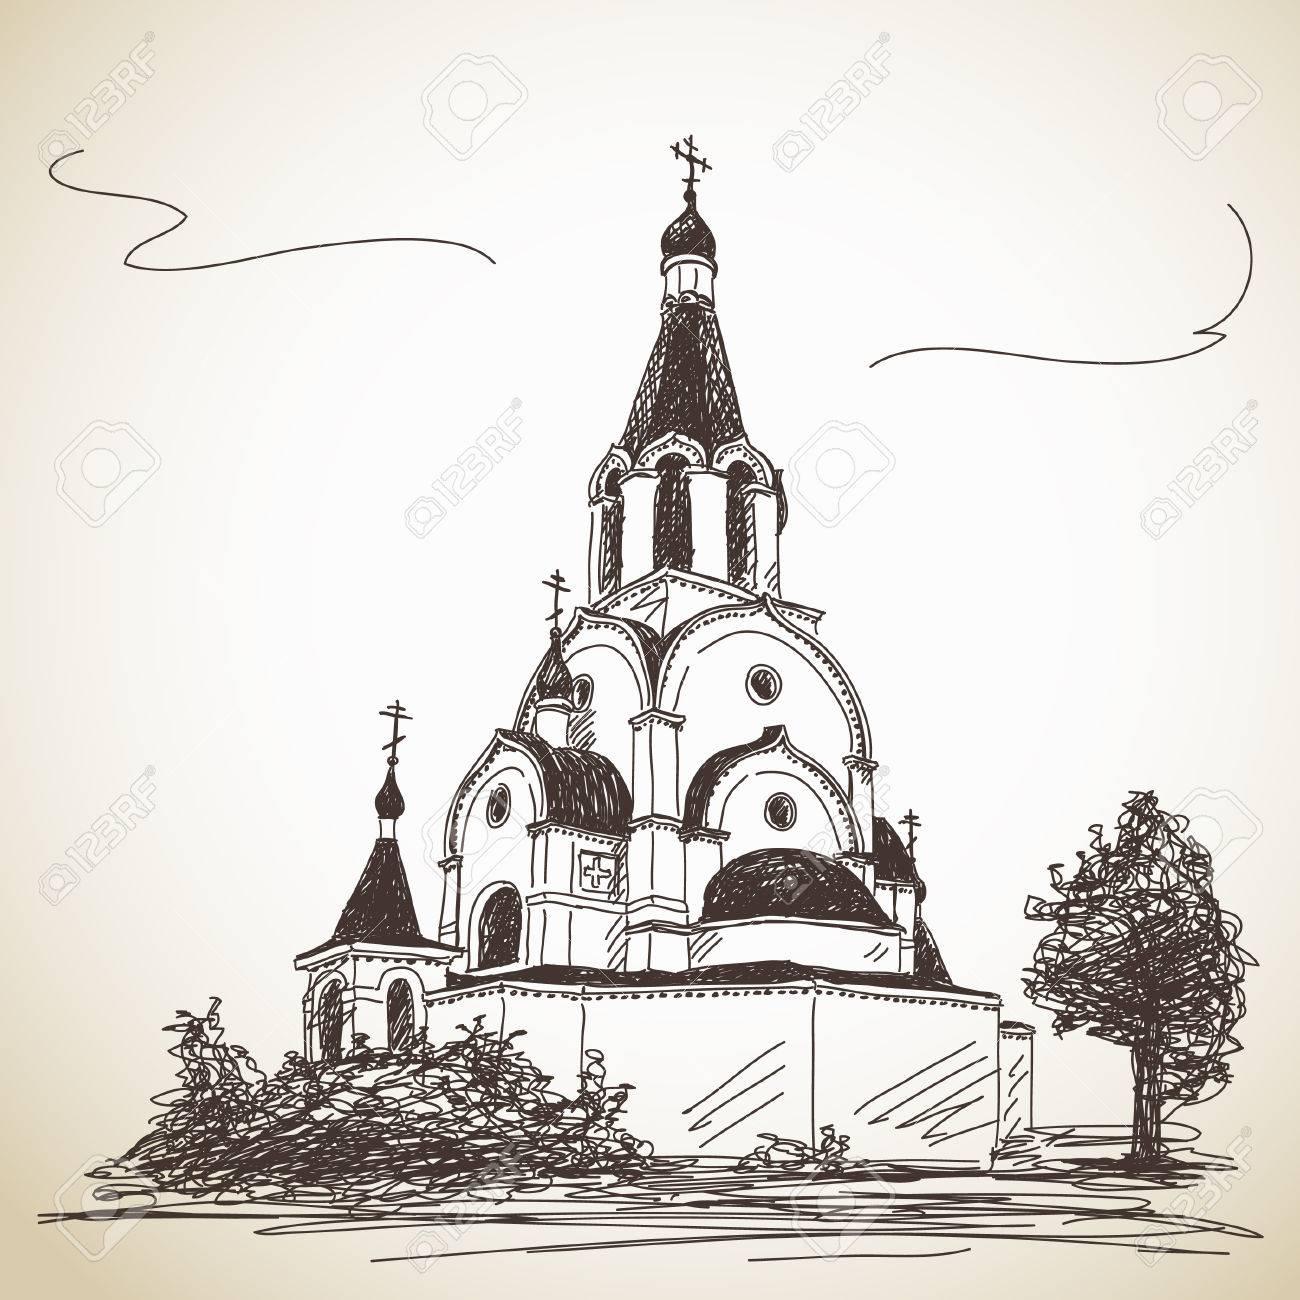 Sketch Of Russian Orthodox Church. Hand Drawn Illustration Royalty ...